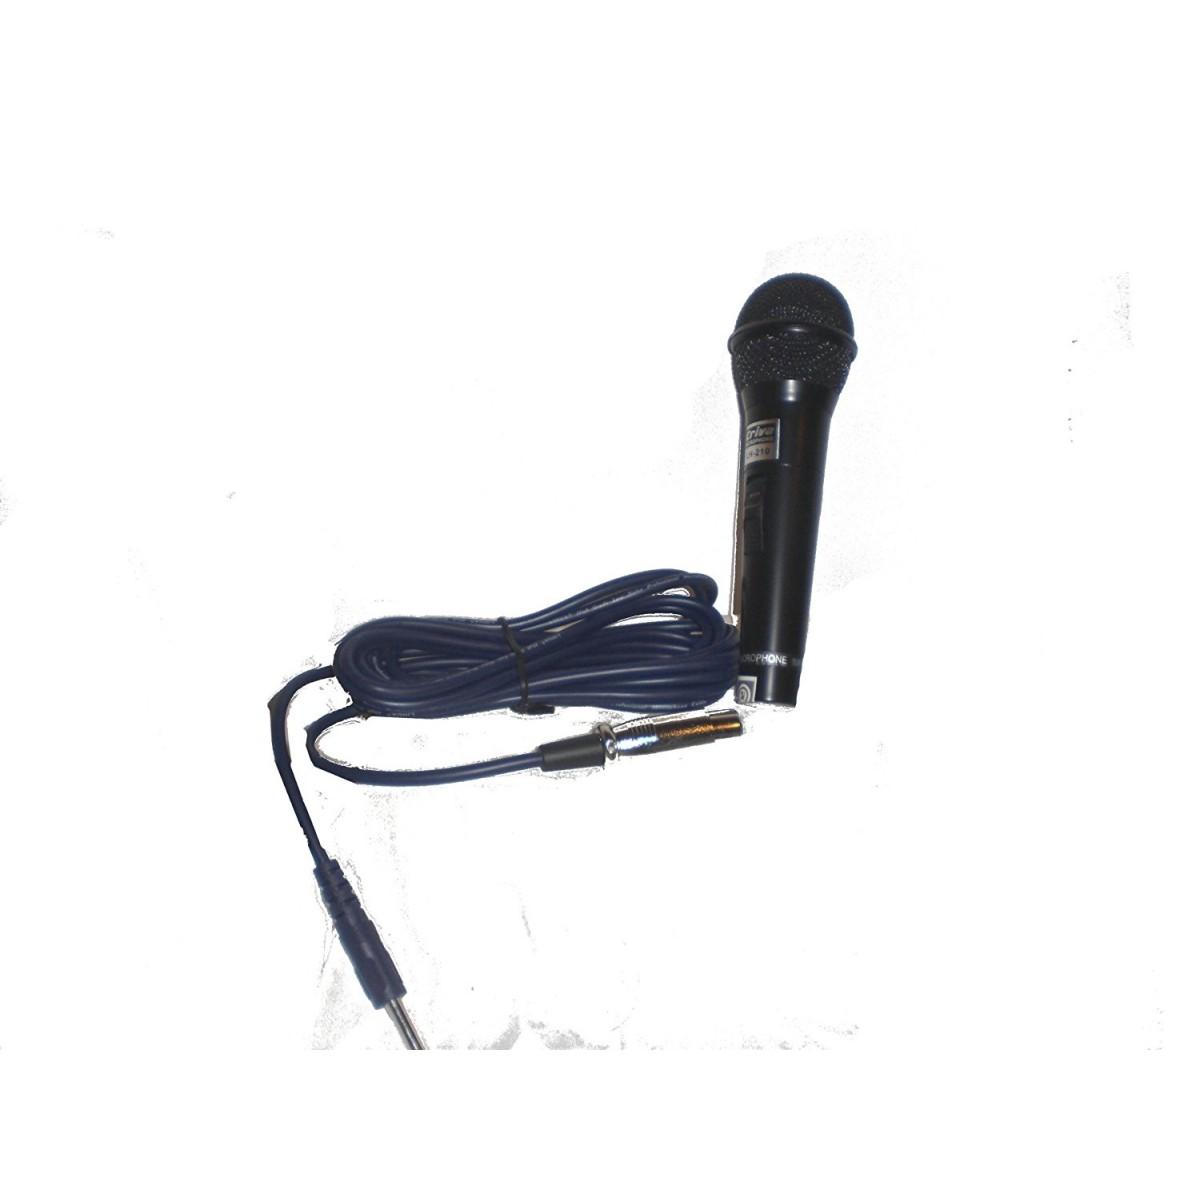 Microfone Dinâmico Profissional Com Fio Criva LH-210